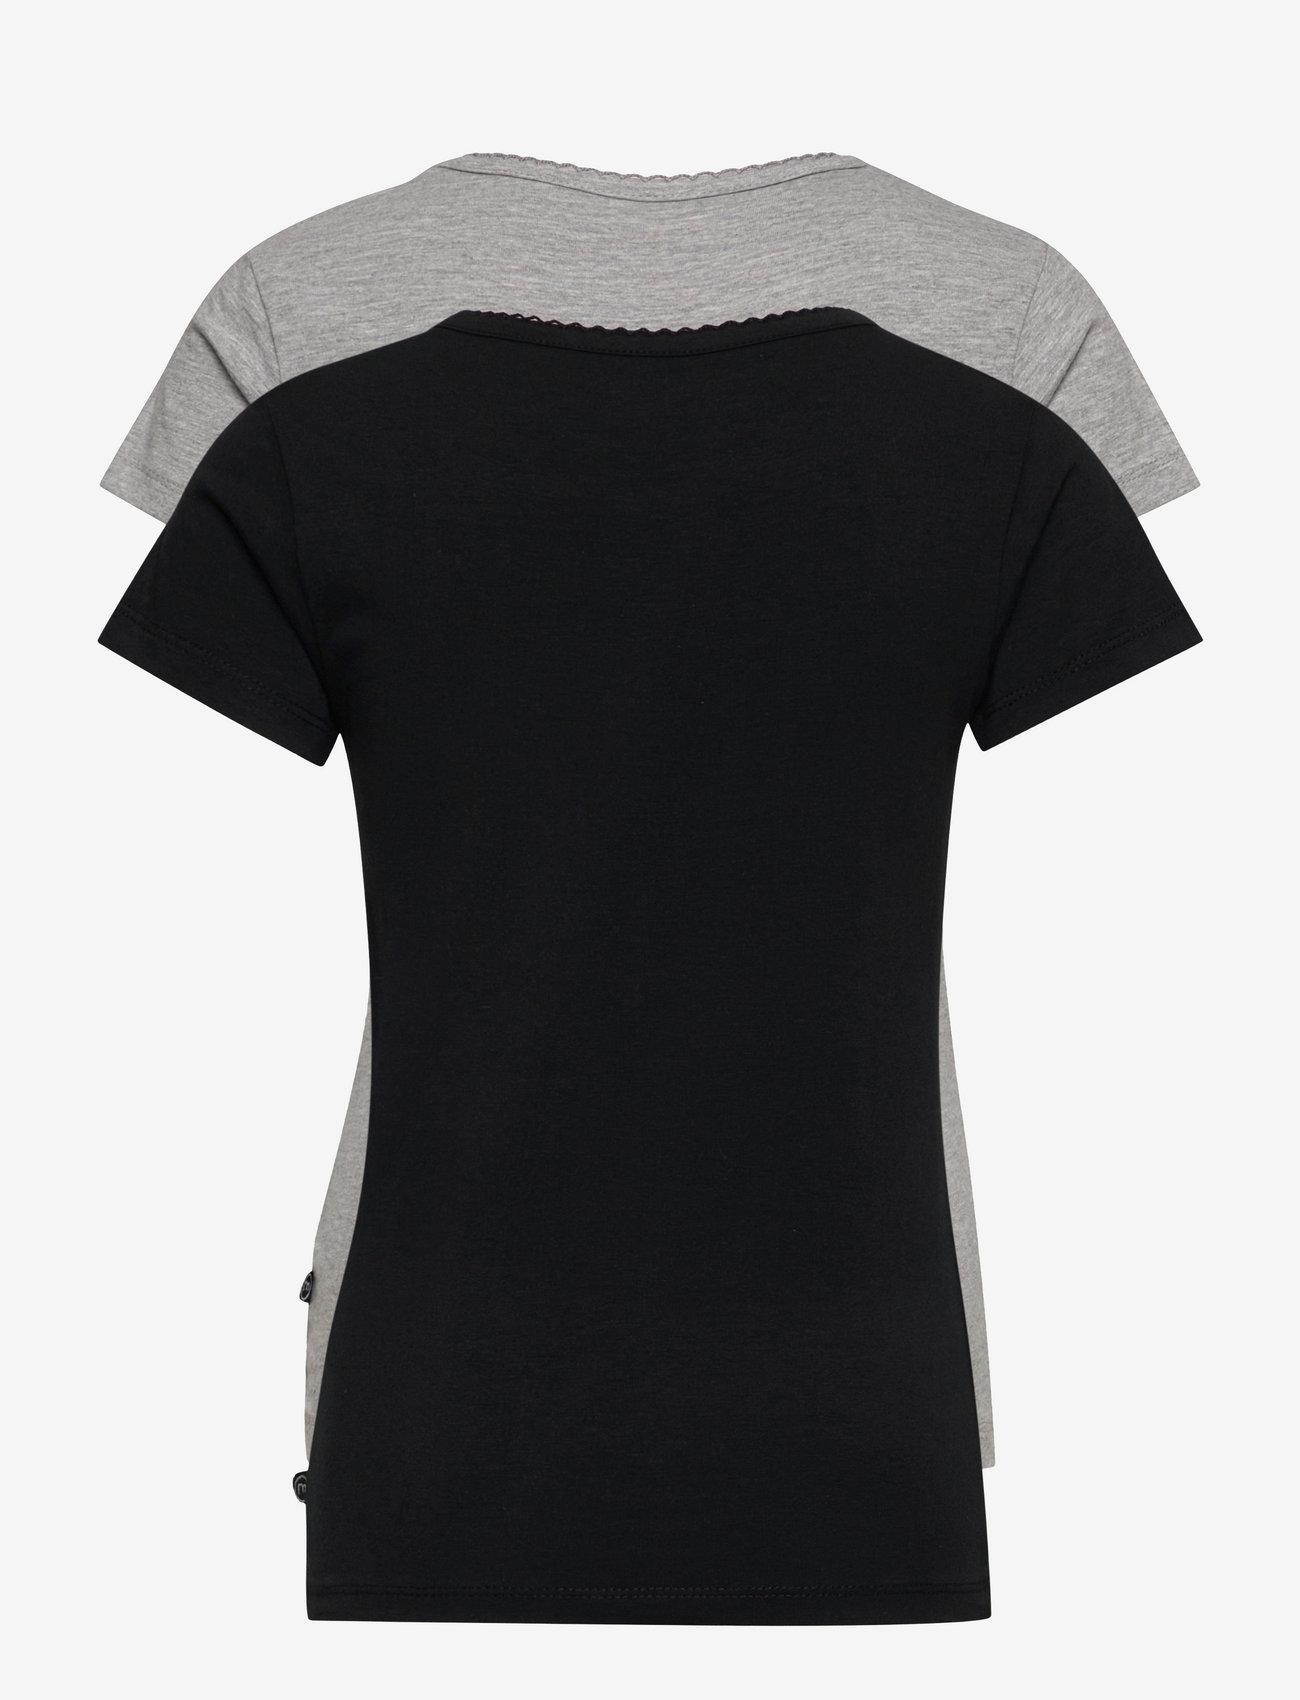 Minymo - Basic 33 -T-shirt SS (2-pack) - krótki rękaw - anthacite black - 1